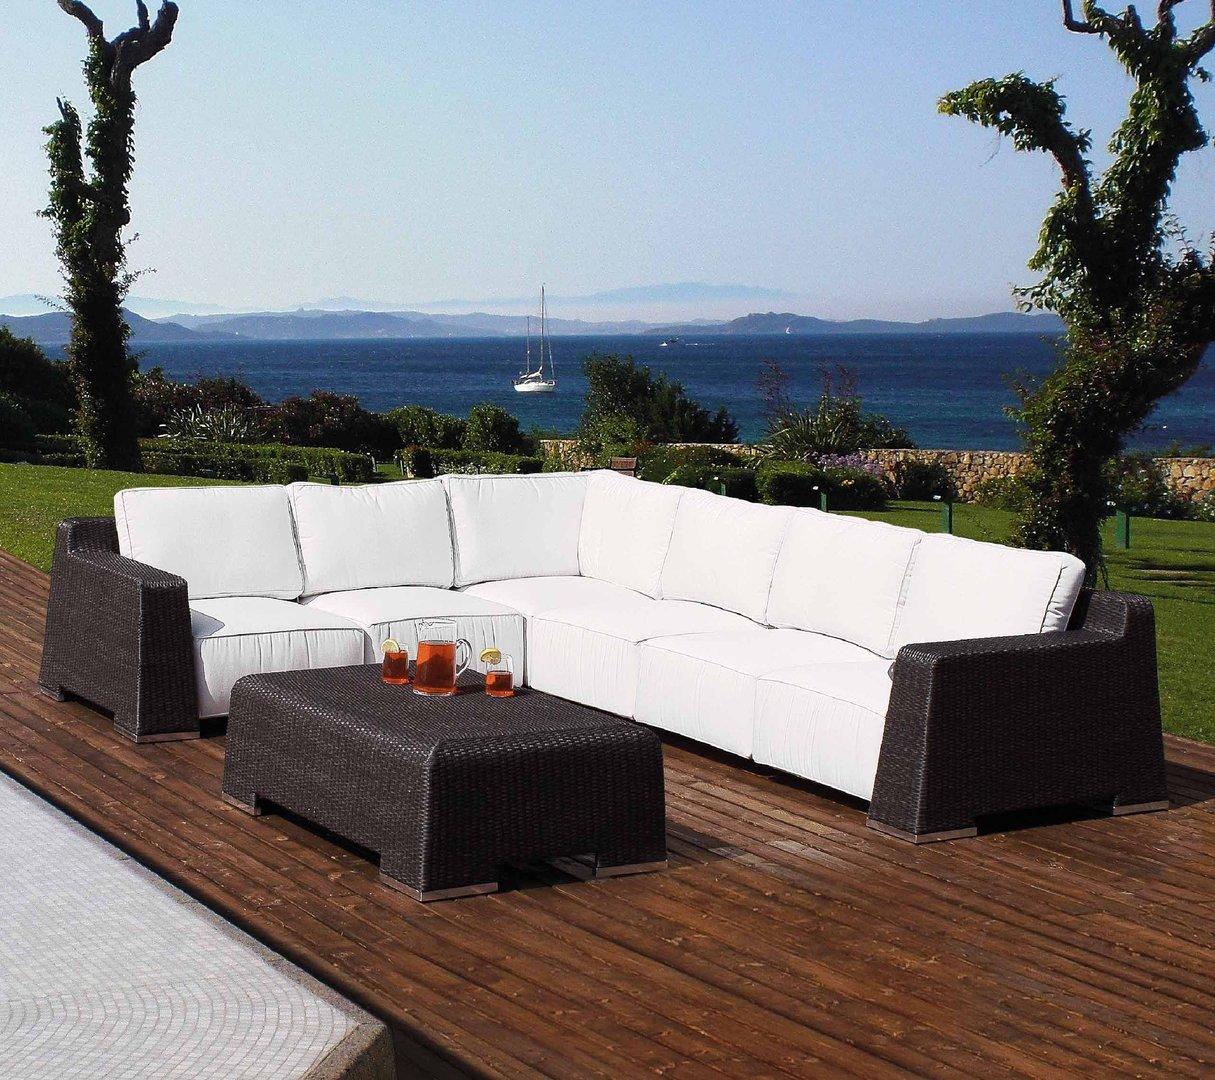 Tavolo basso da giardino rattan sintetico mobili for Mobili giardino rattan sintetico